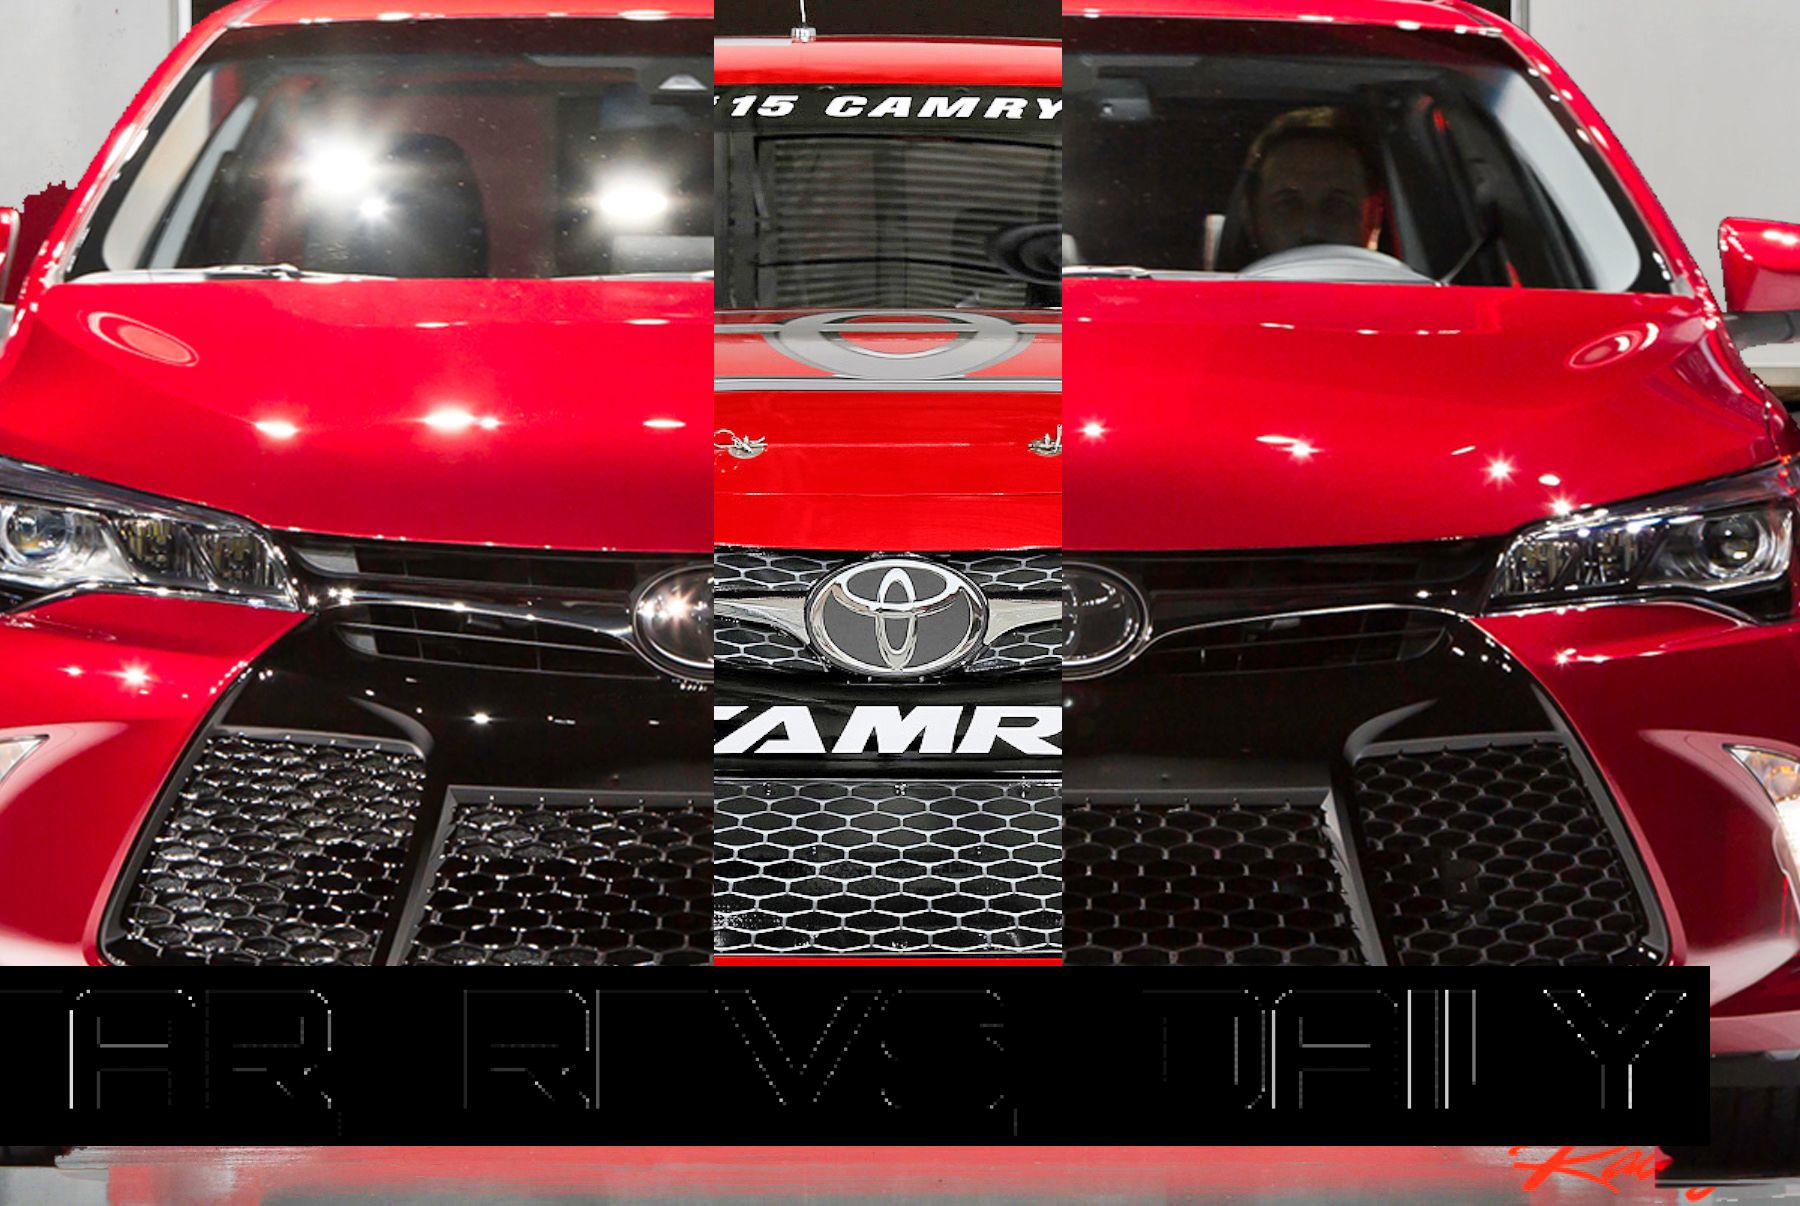 2015 Toyota Camry NASCAR 14